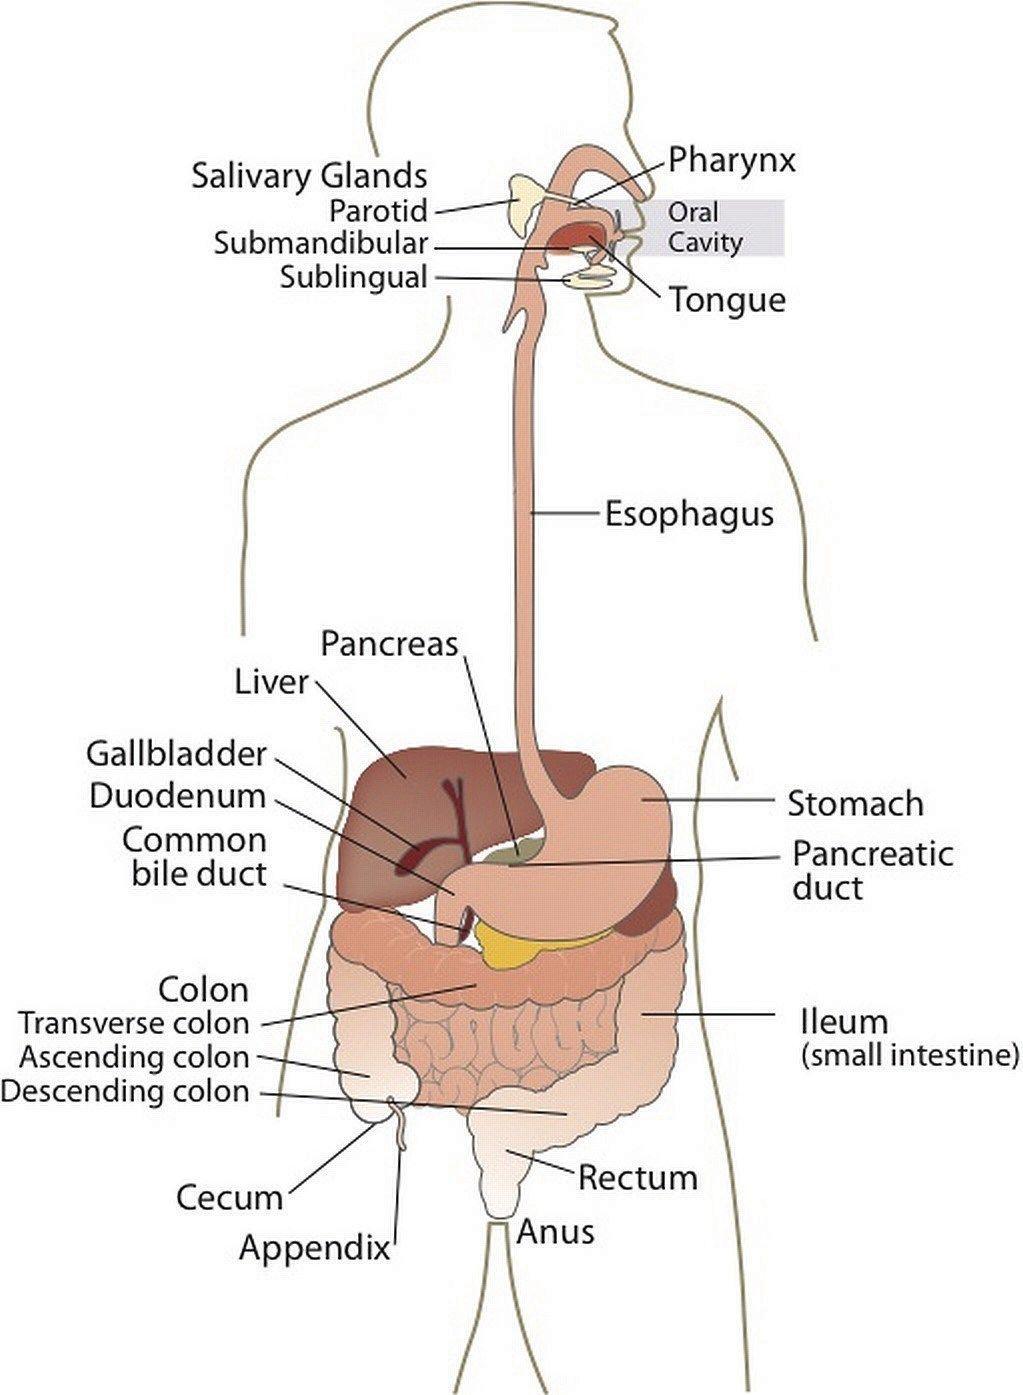 digestive system diagram to label digestive system diagram to label diagram of the digestive system [ 1023 x 1395 Pixel ]